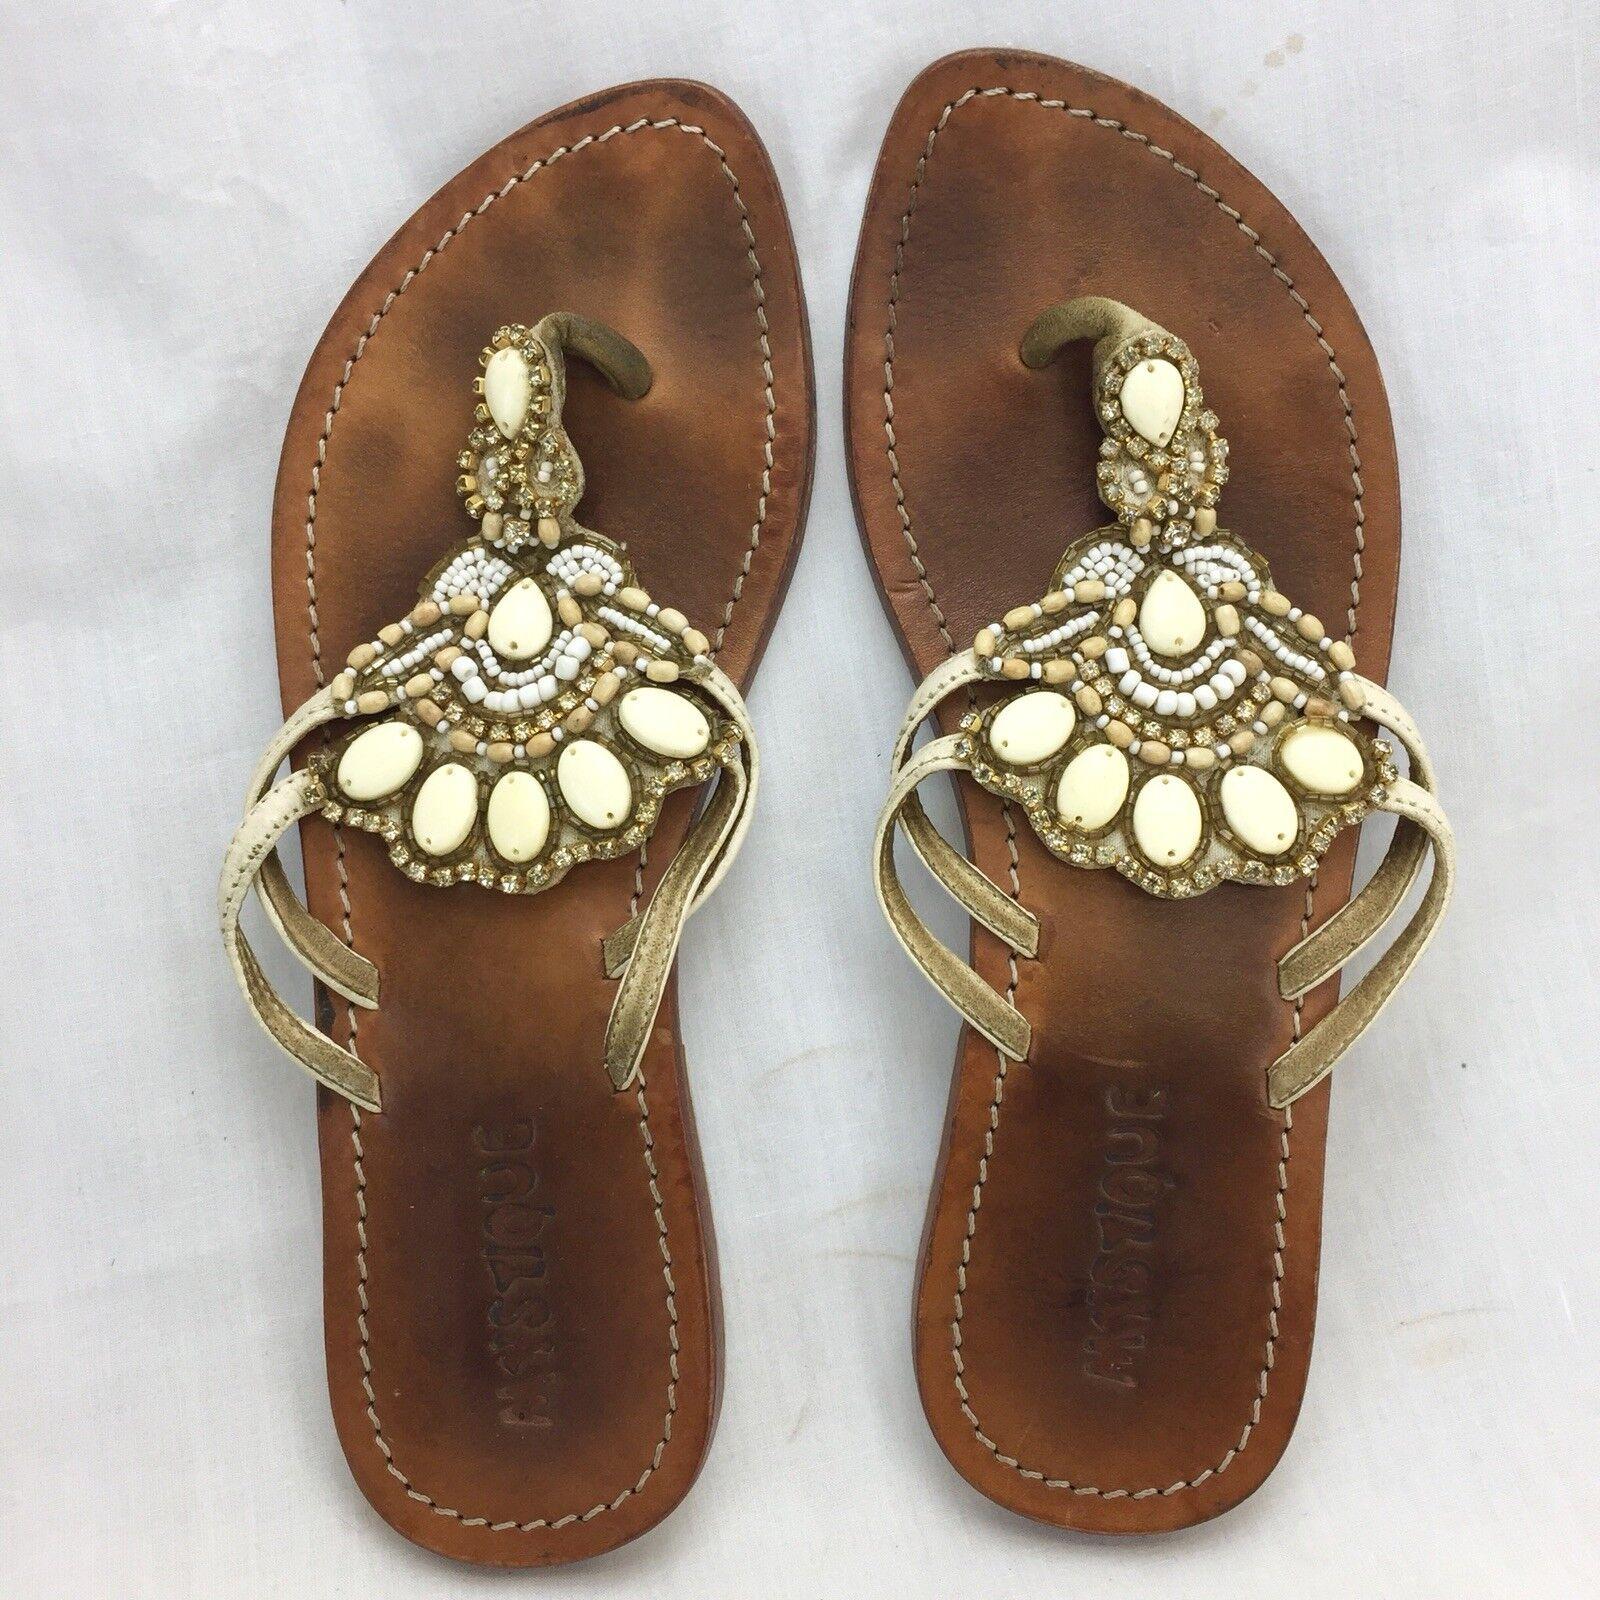 Mystique Flip Flop Thong Leather Sandals Womens Size 6 Stones Embellished